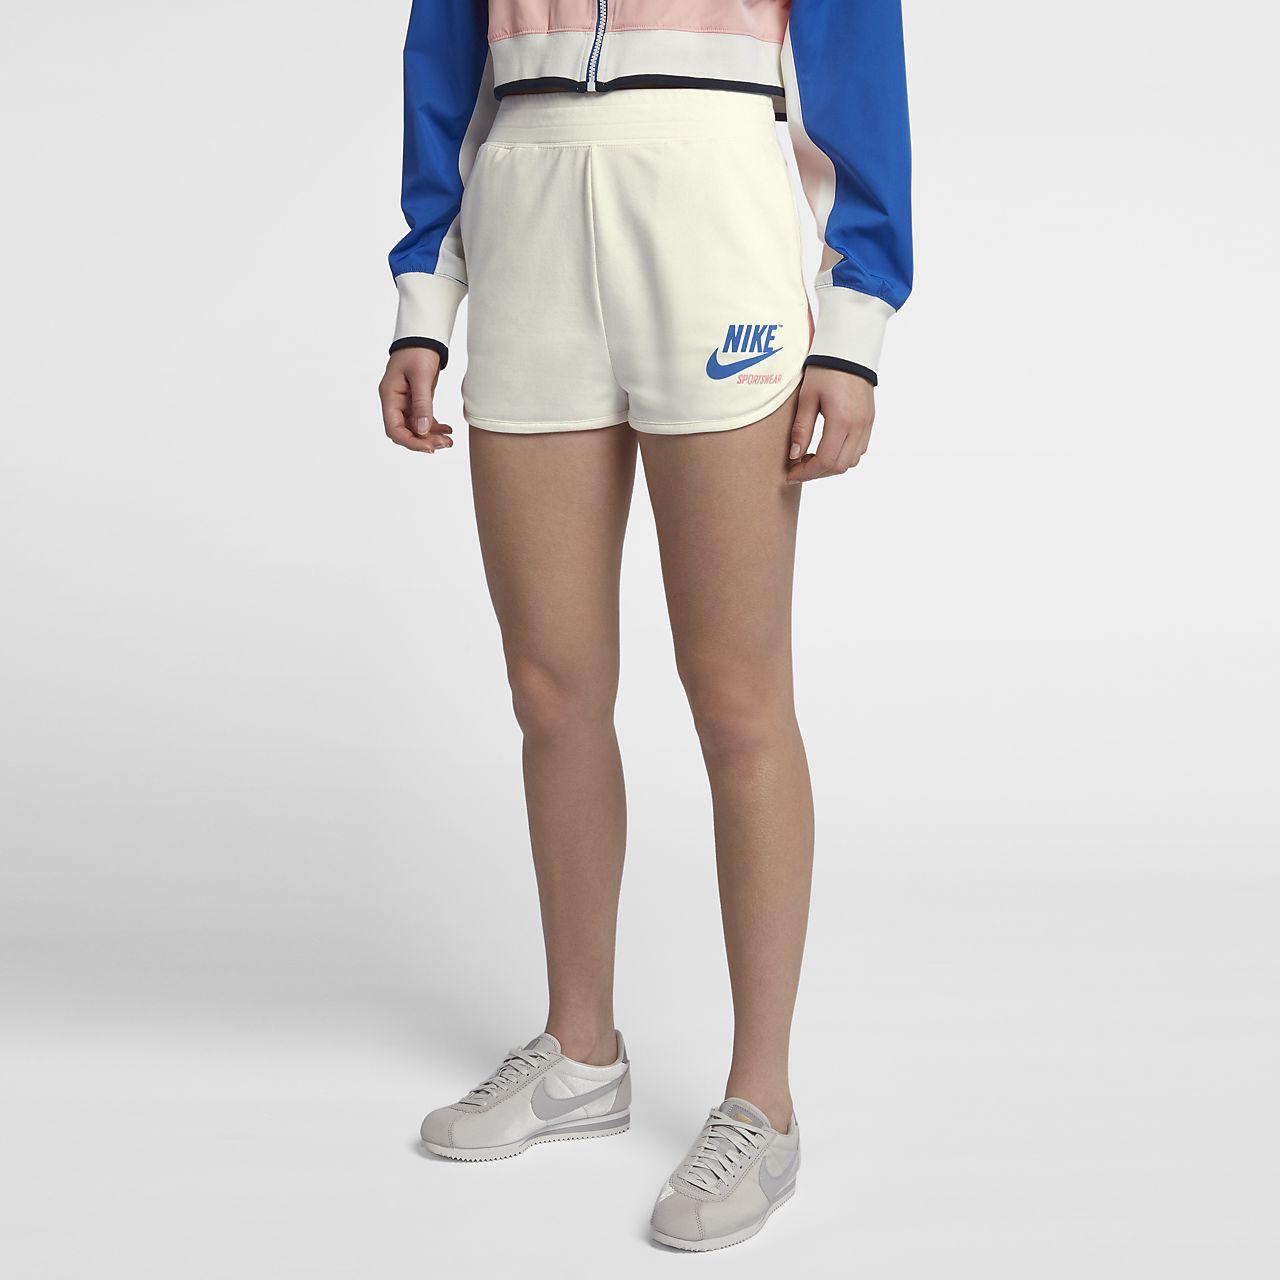 Nike Air Max 90 Para Hombre 11 Cortocircuitos Pulgadas venta gran venta aclaramiento populares Q25FKoI